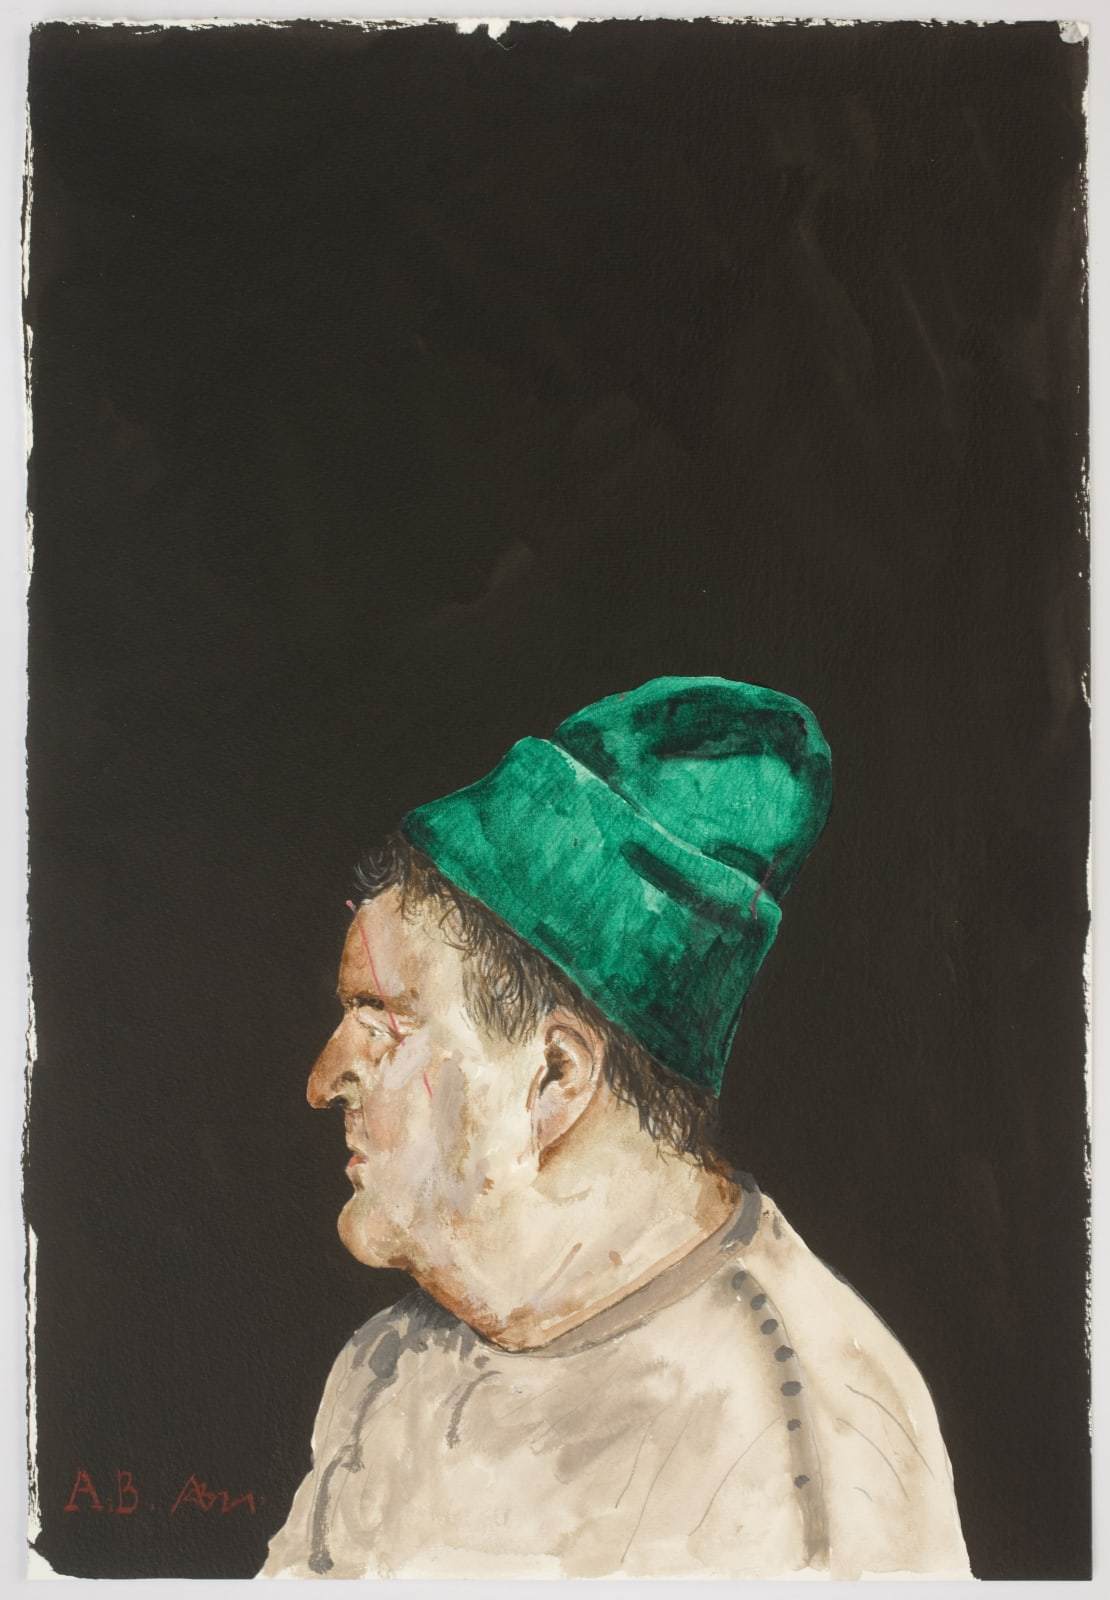 Adam Birtwistle, Self-Portrait, 2020